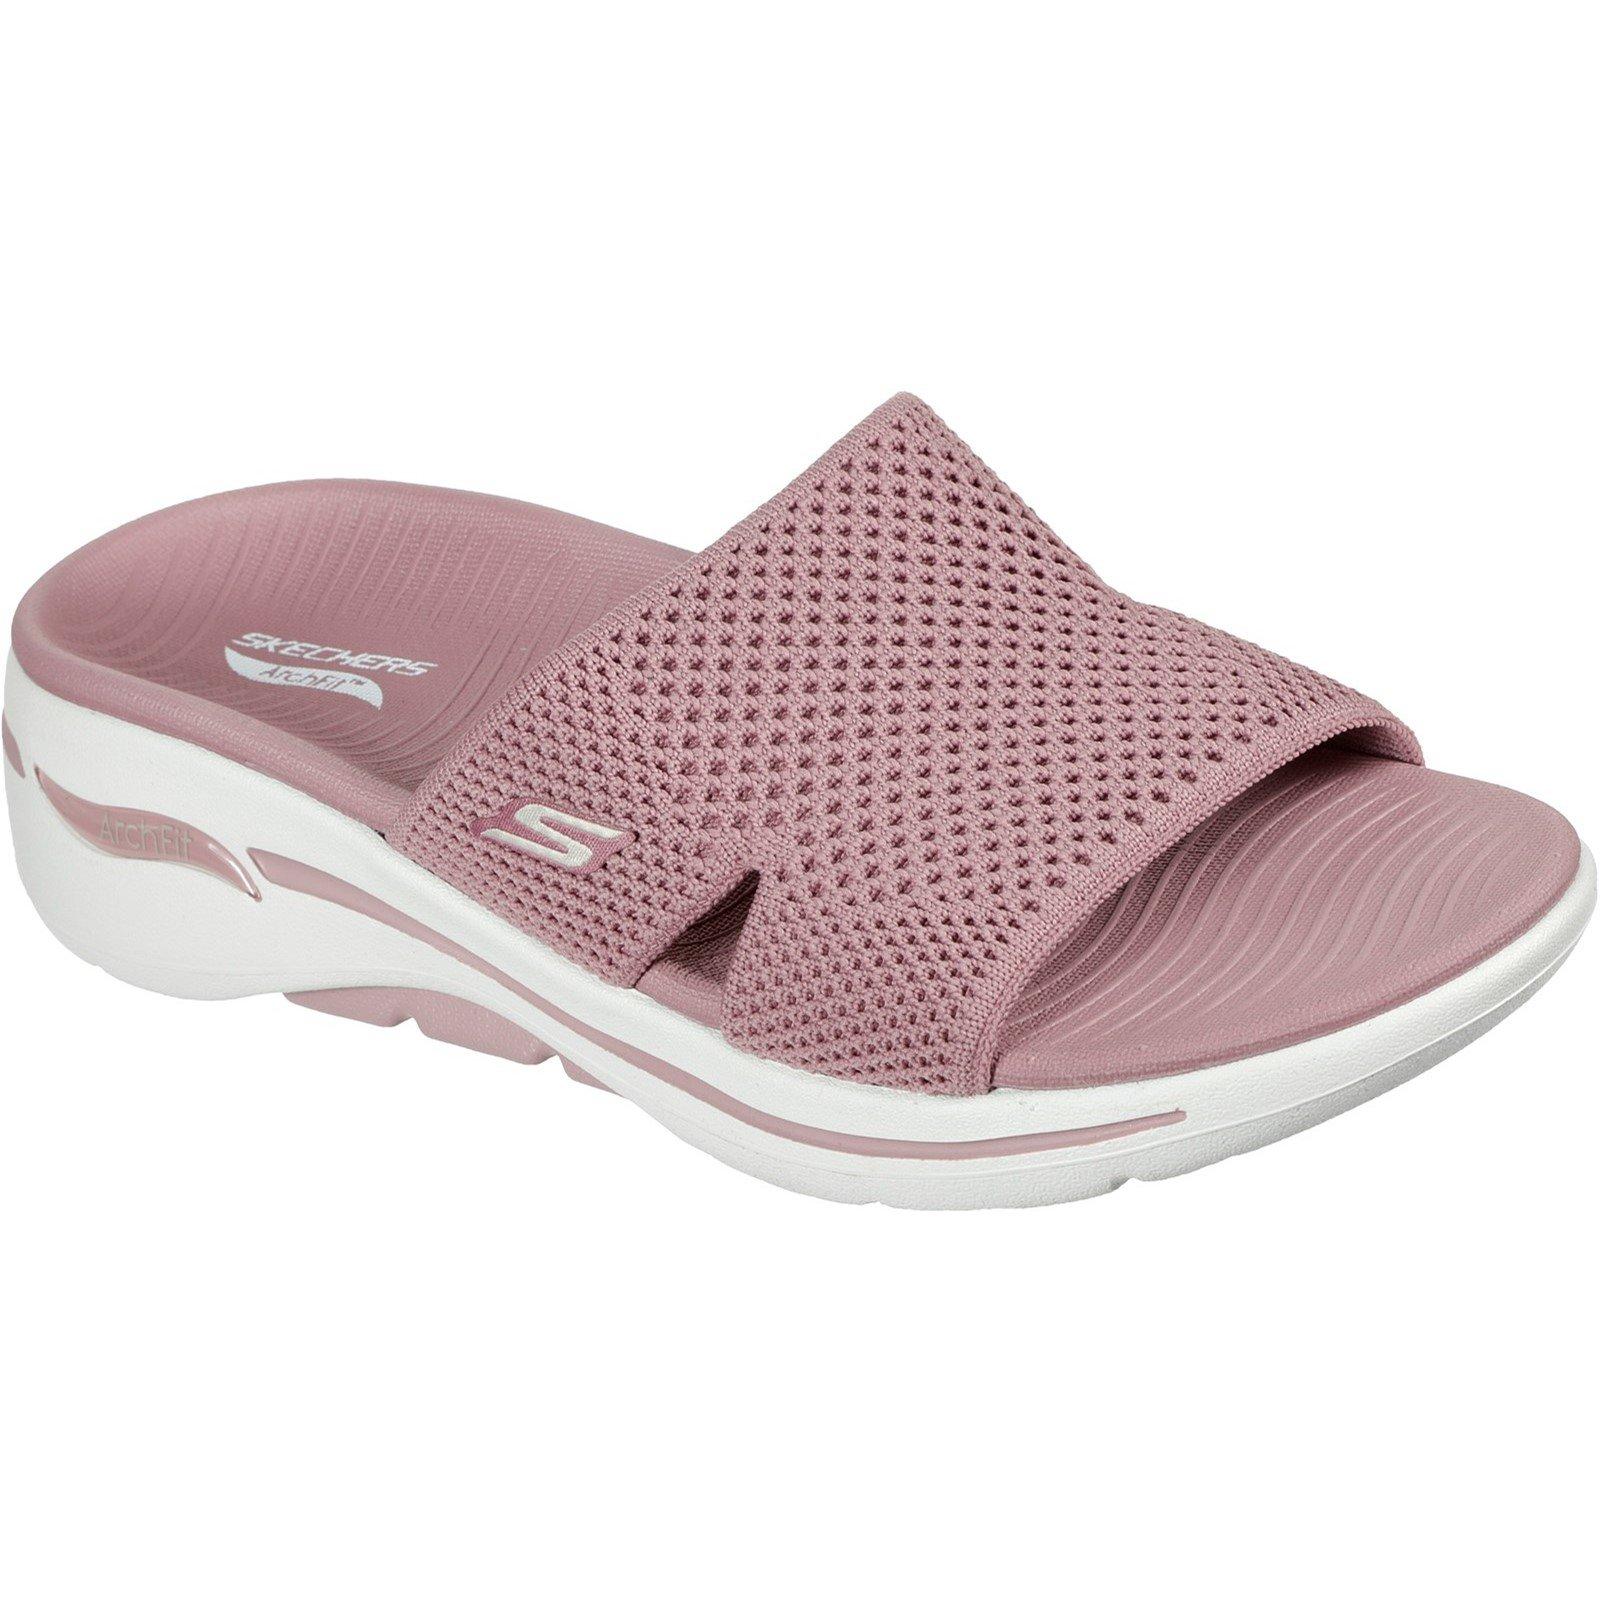 Skechers Women's Go Walk Arch Fit Worthy Summer Sandal Various Colours 32152 - Rose 7